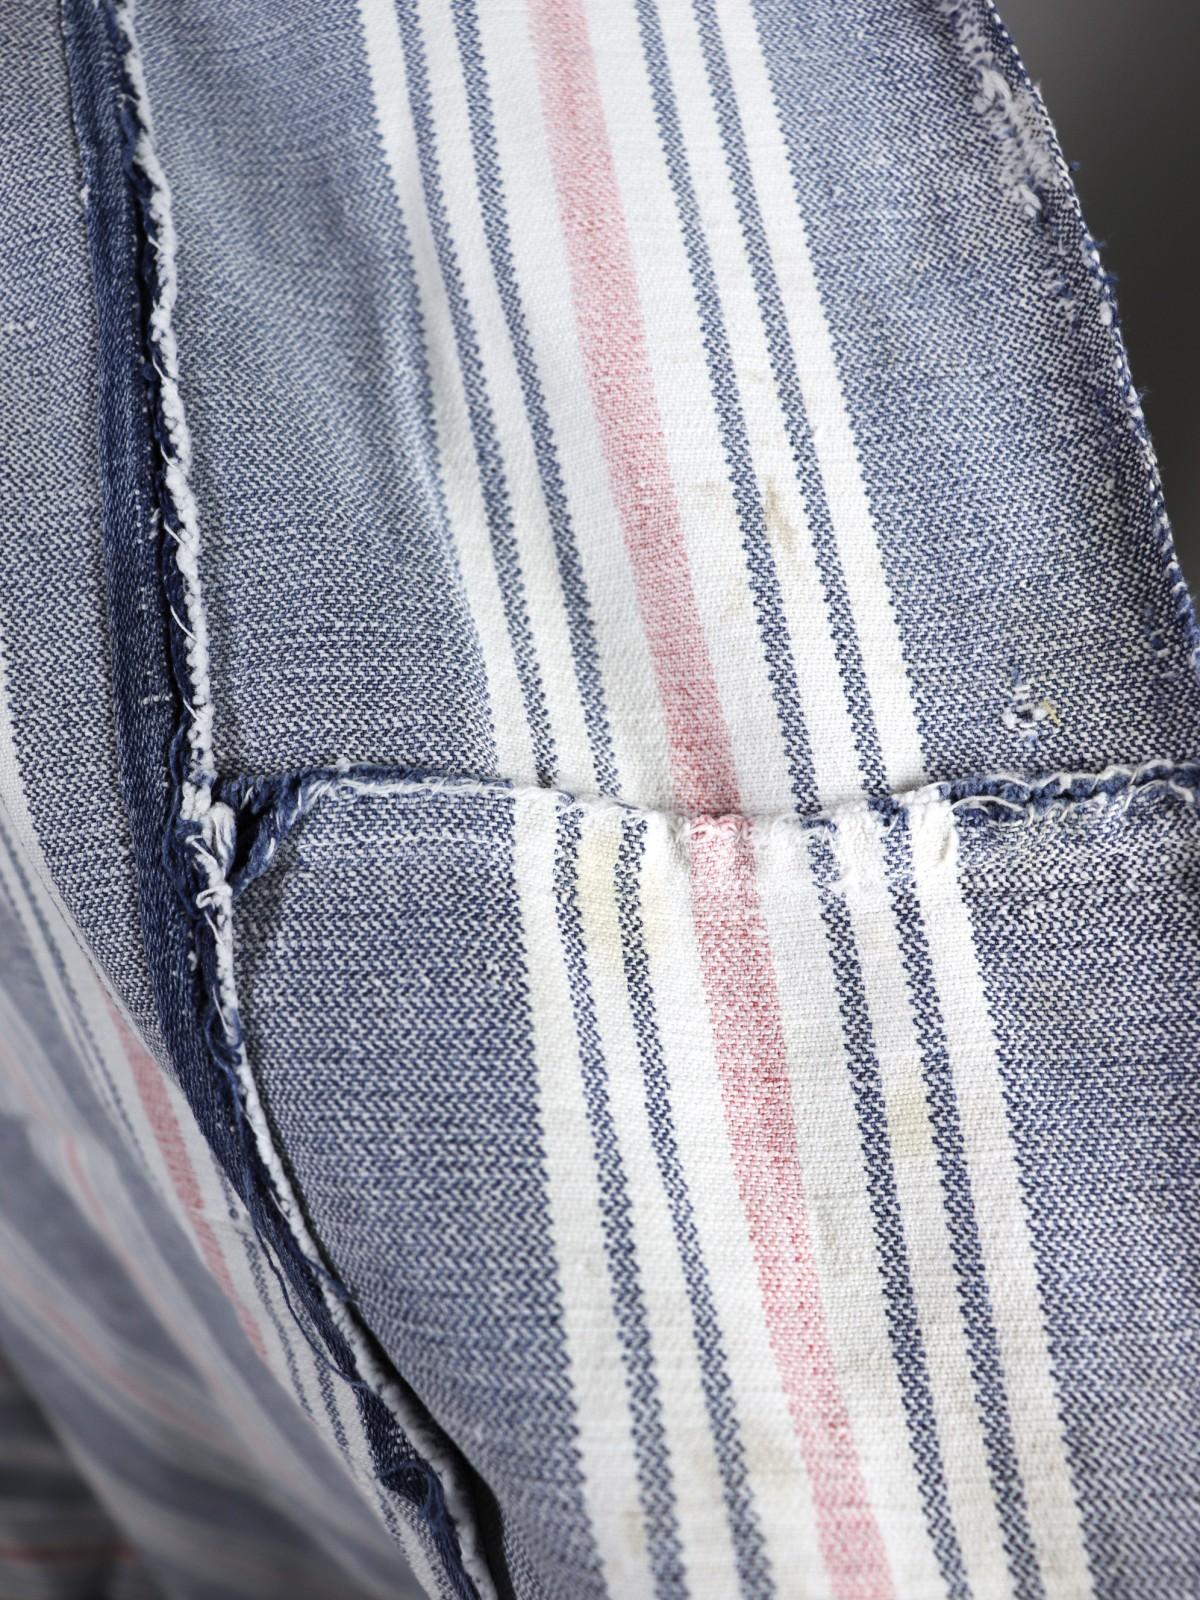 1960's, talian cotton fabric, upholstery fabric, Italy